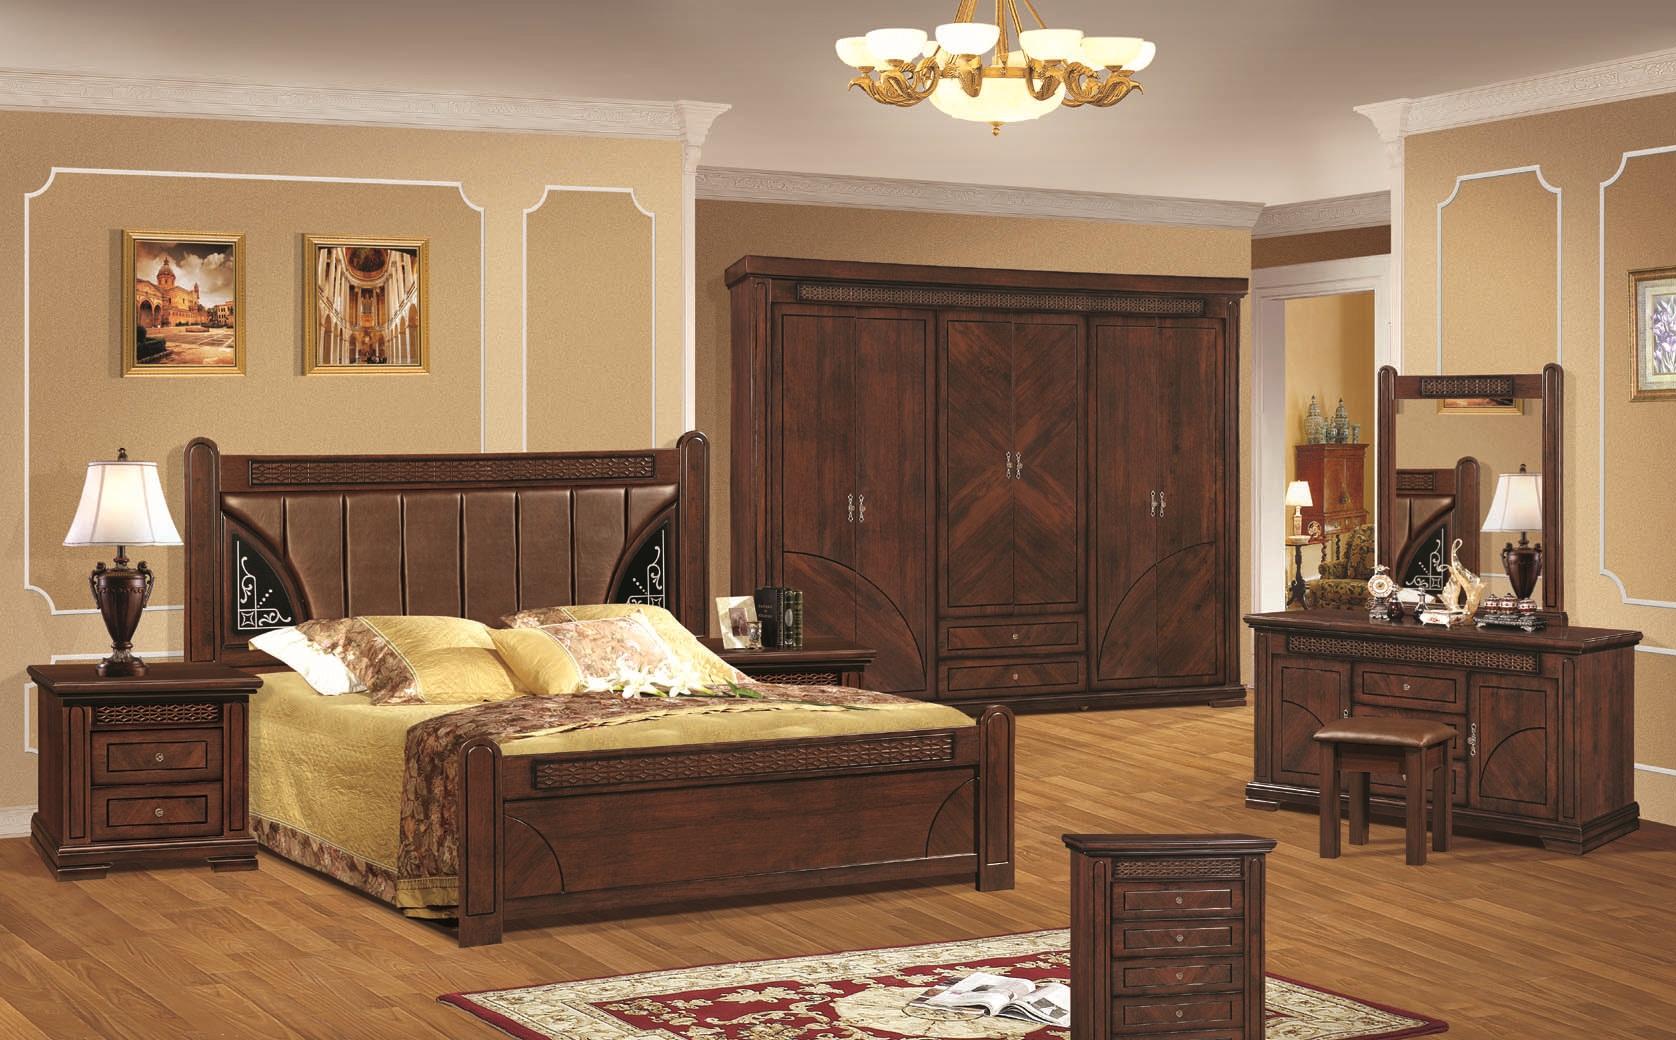 بالصور غرف نوم خشب , اجمل تصاميم غرف النوم الخشب 4508 9